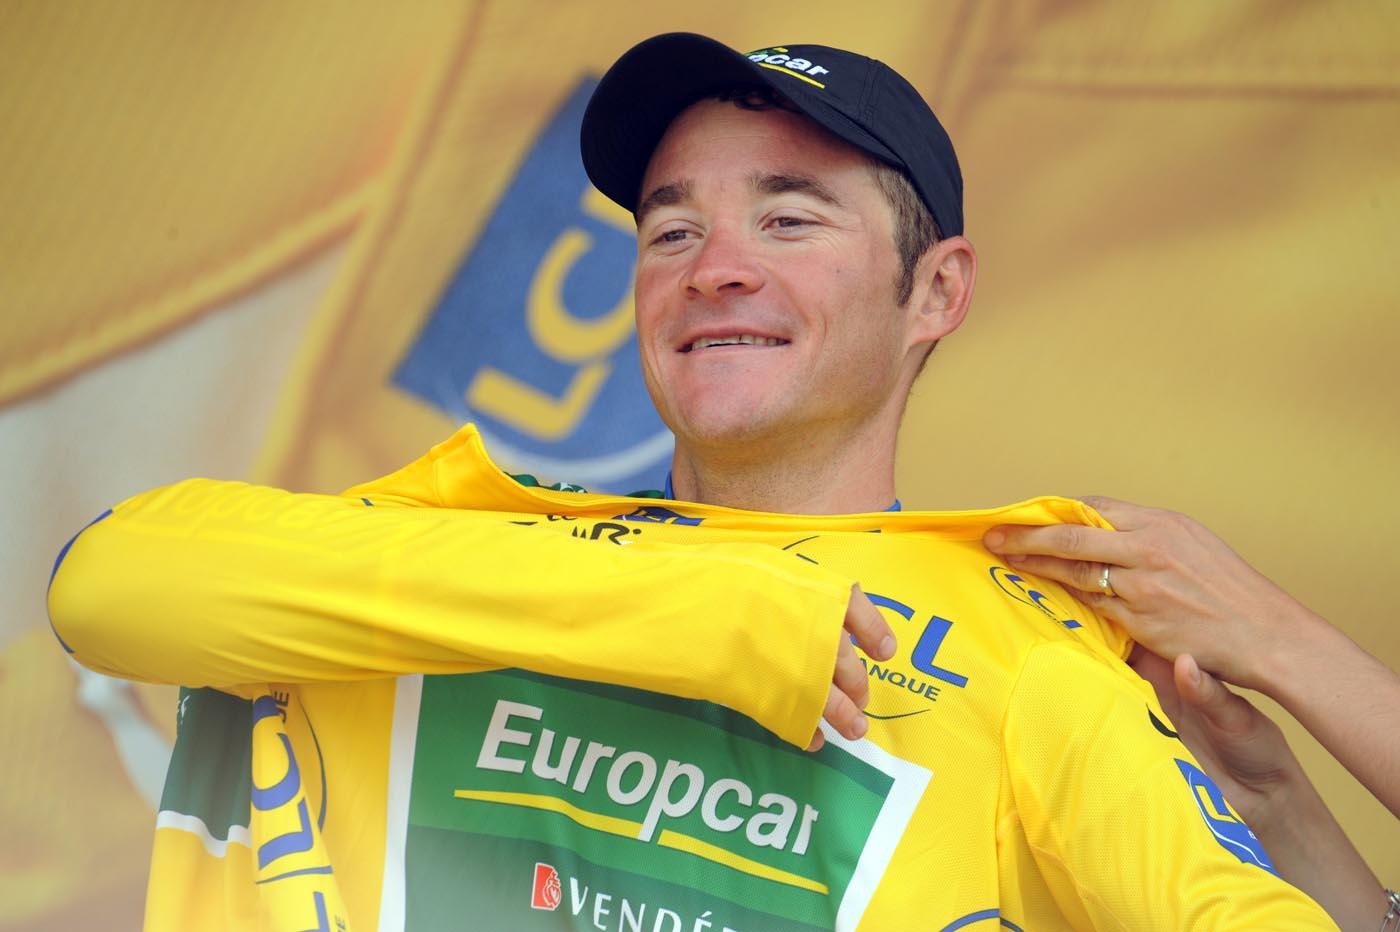 Thomas Voeckler on podium, Tour de France 2011, stage 13